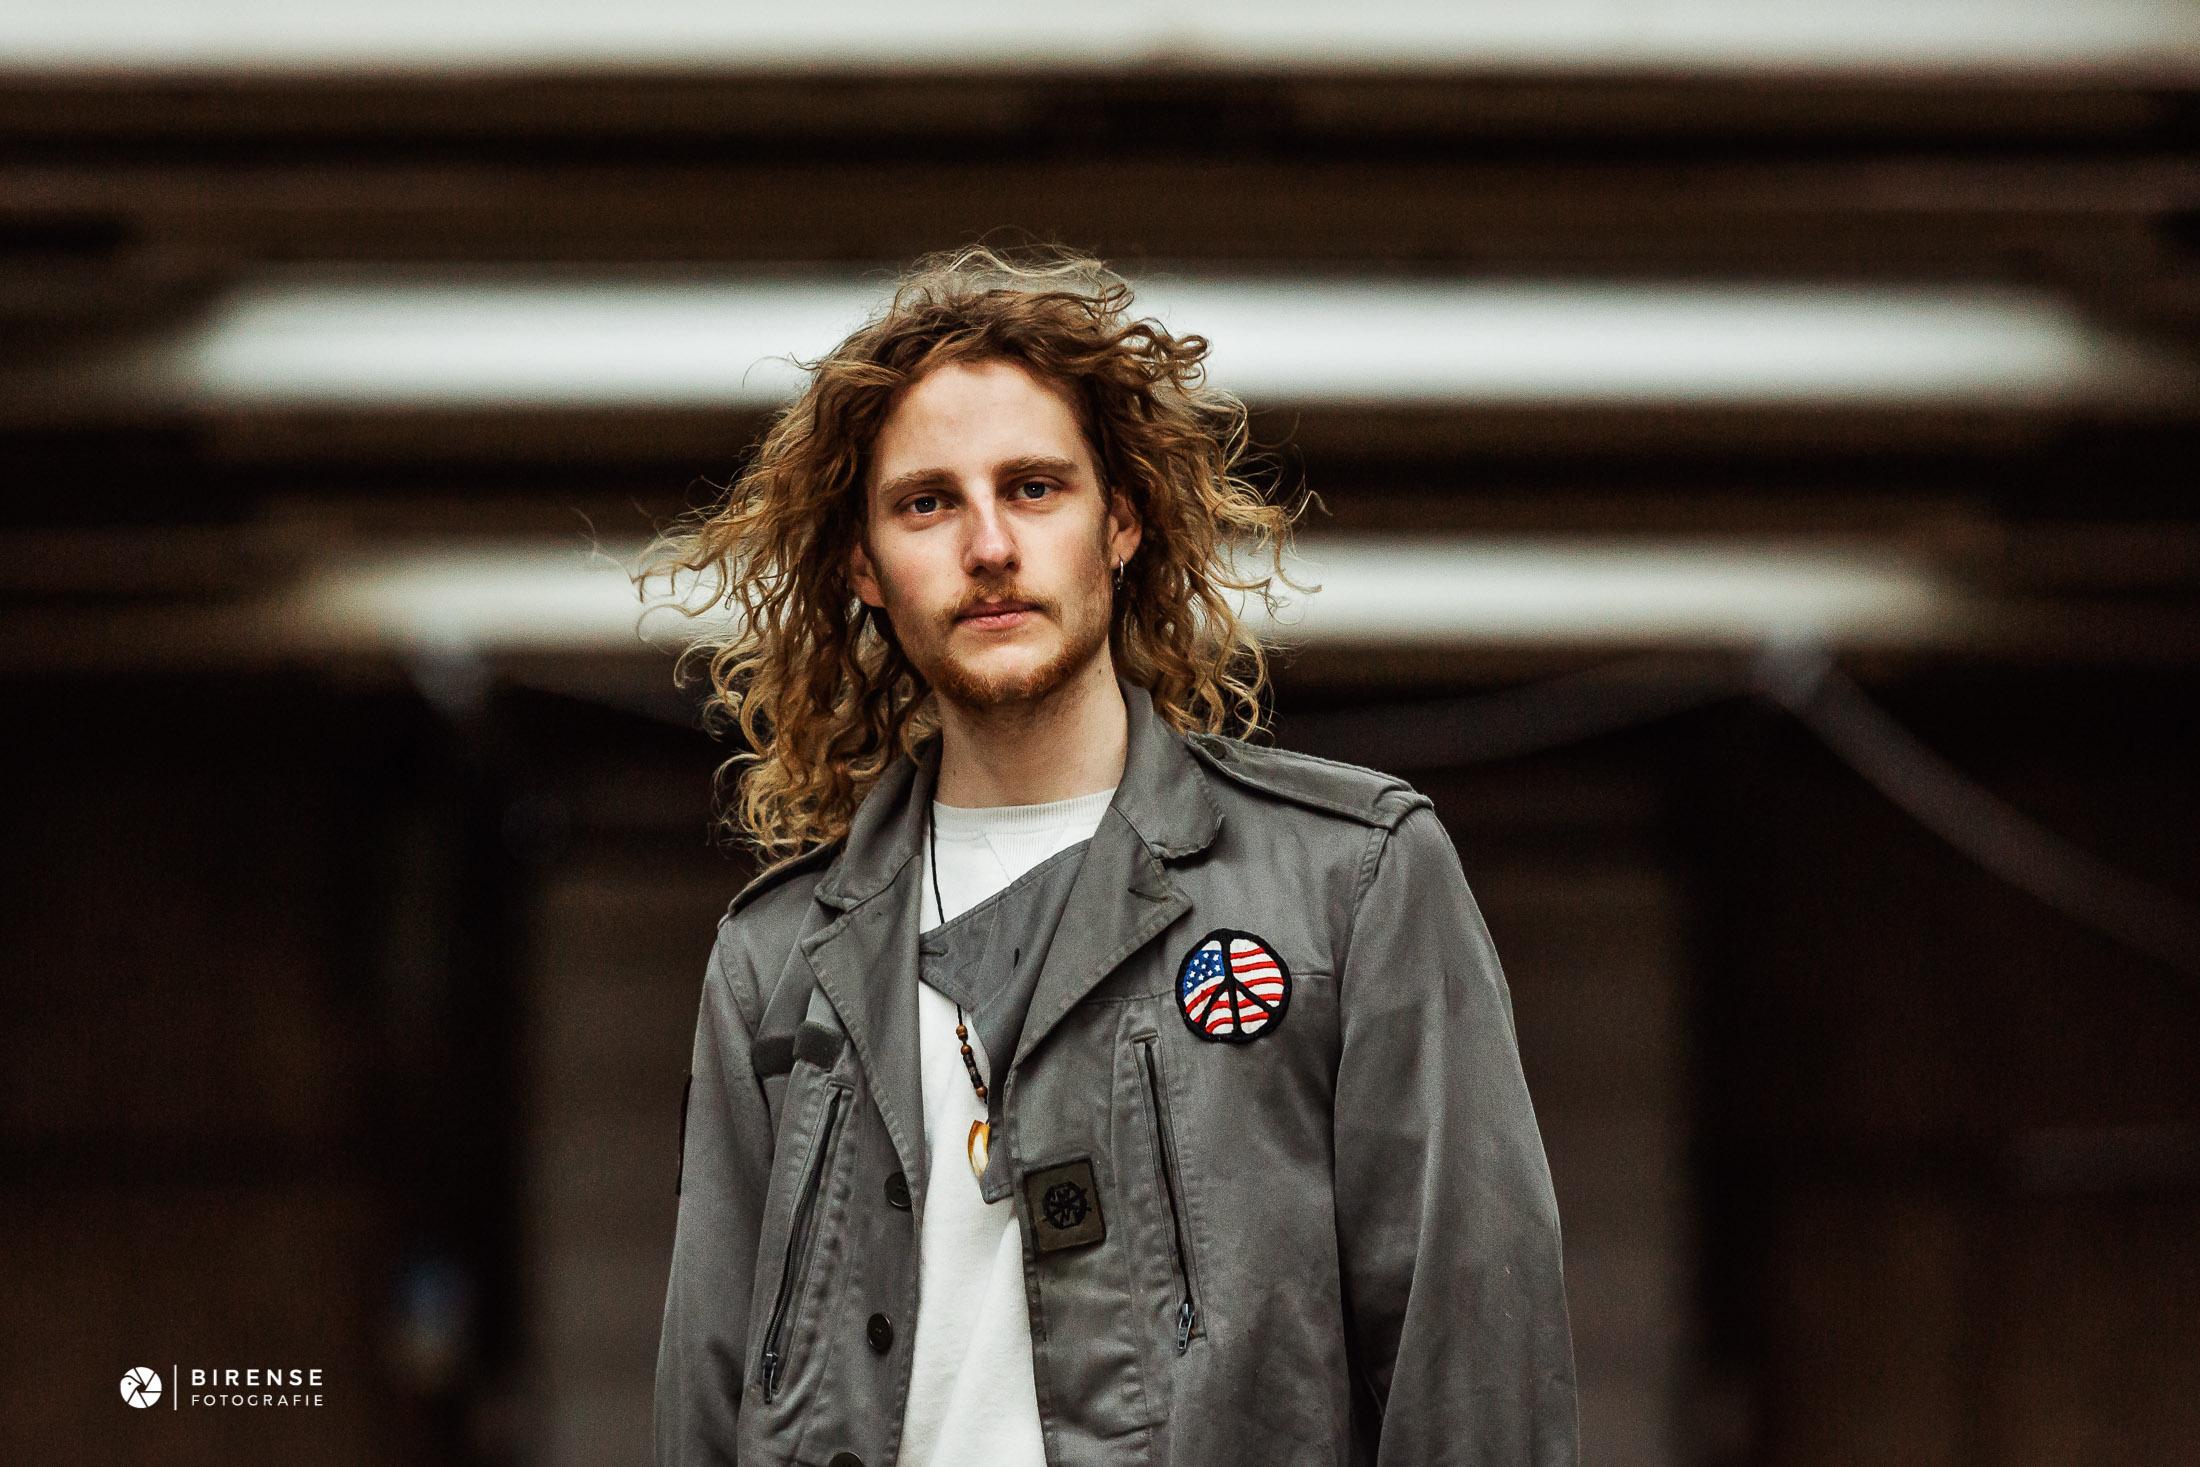 Portretfotografie Between The Jars rock band The Netherlands basguitar portrait by Birense Fotografie